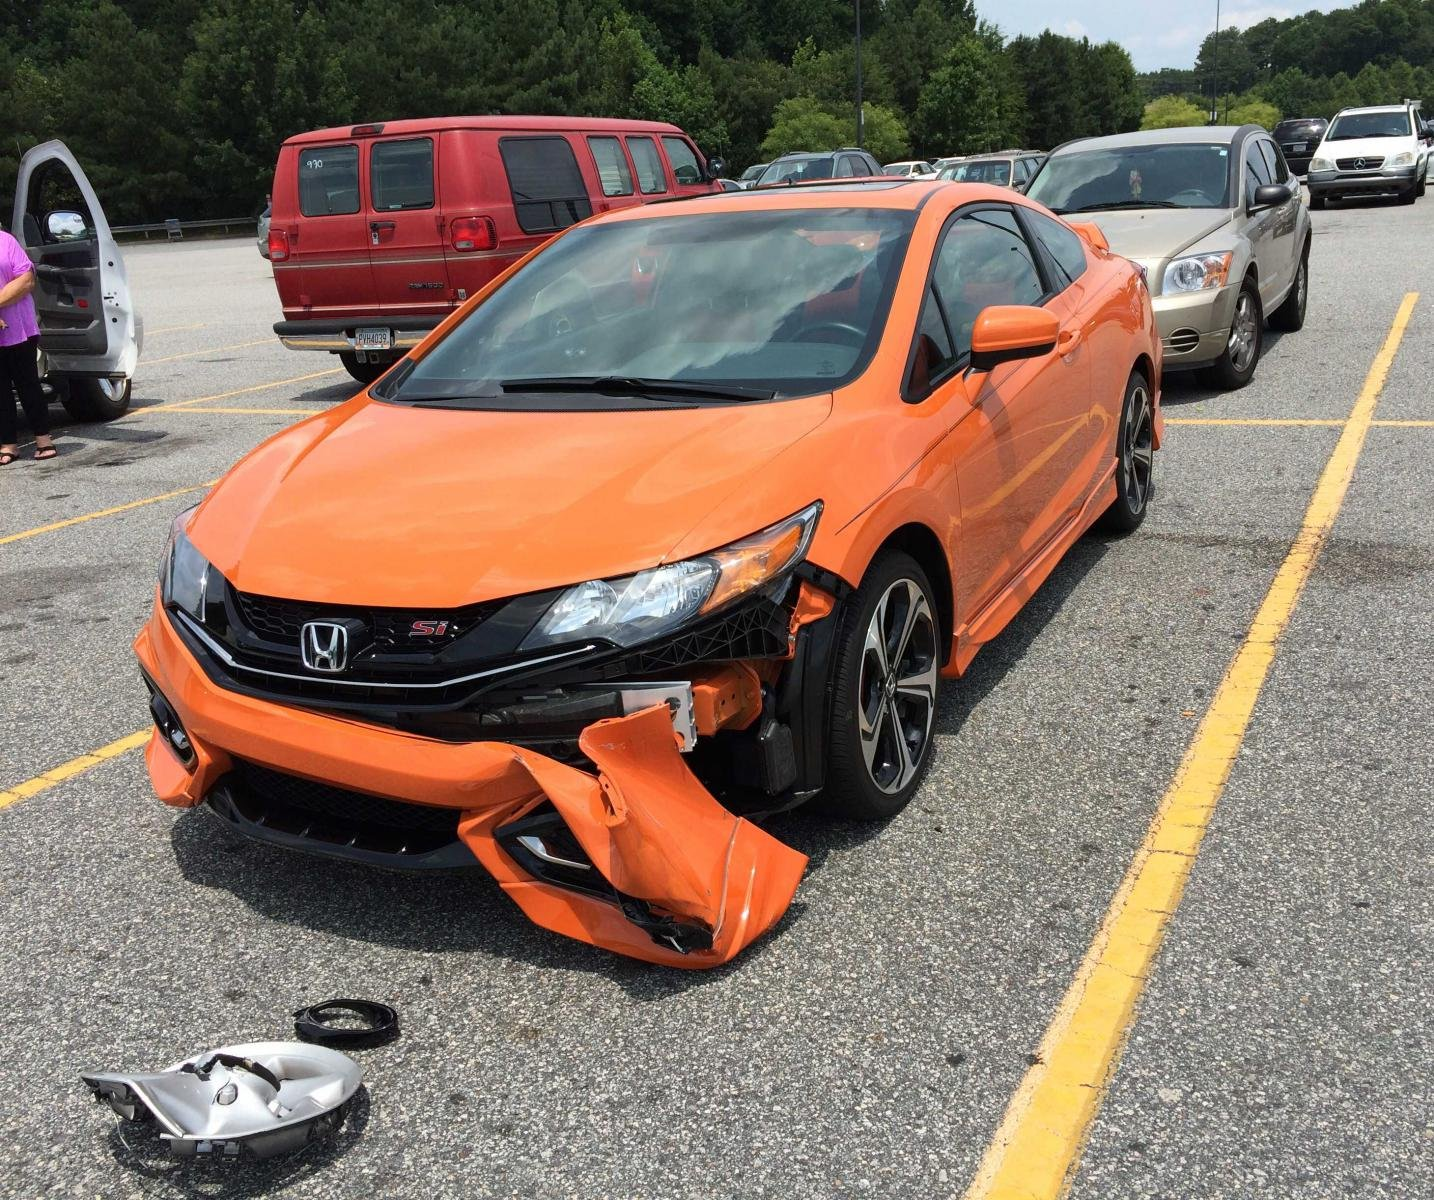 2014 honda civic si owner s lounge car accident 4 c jpg